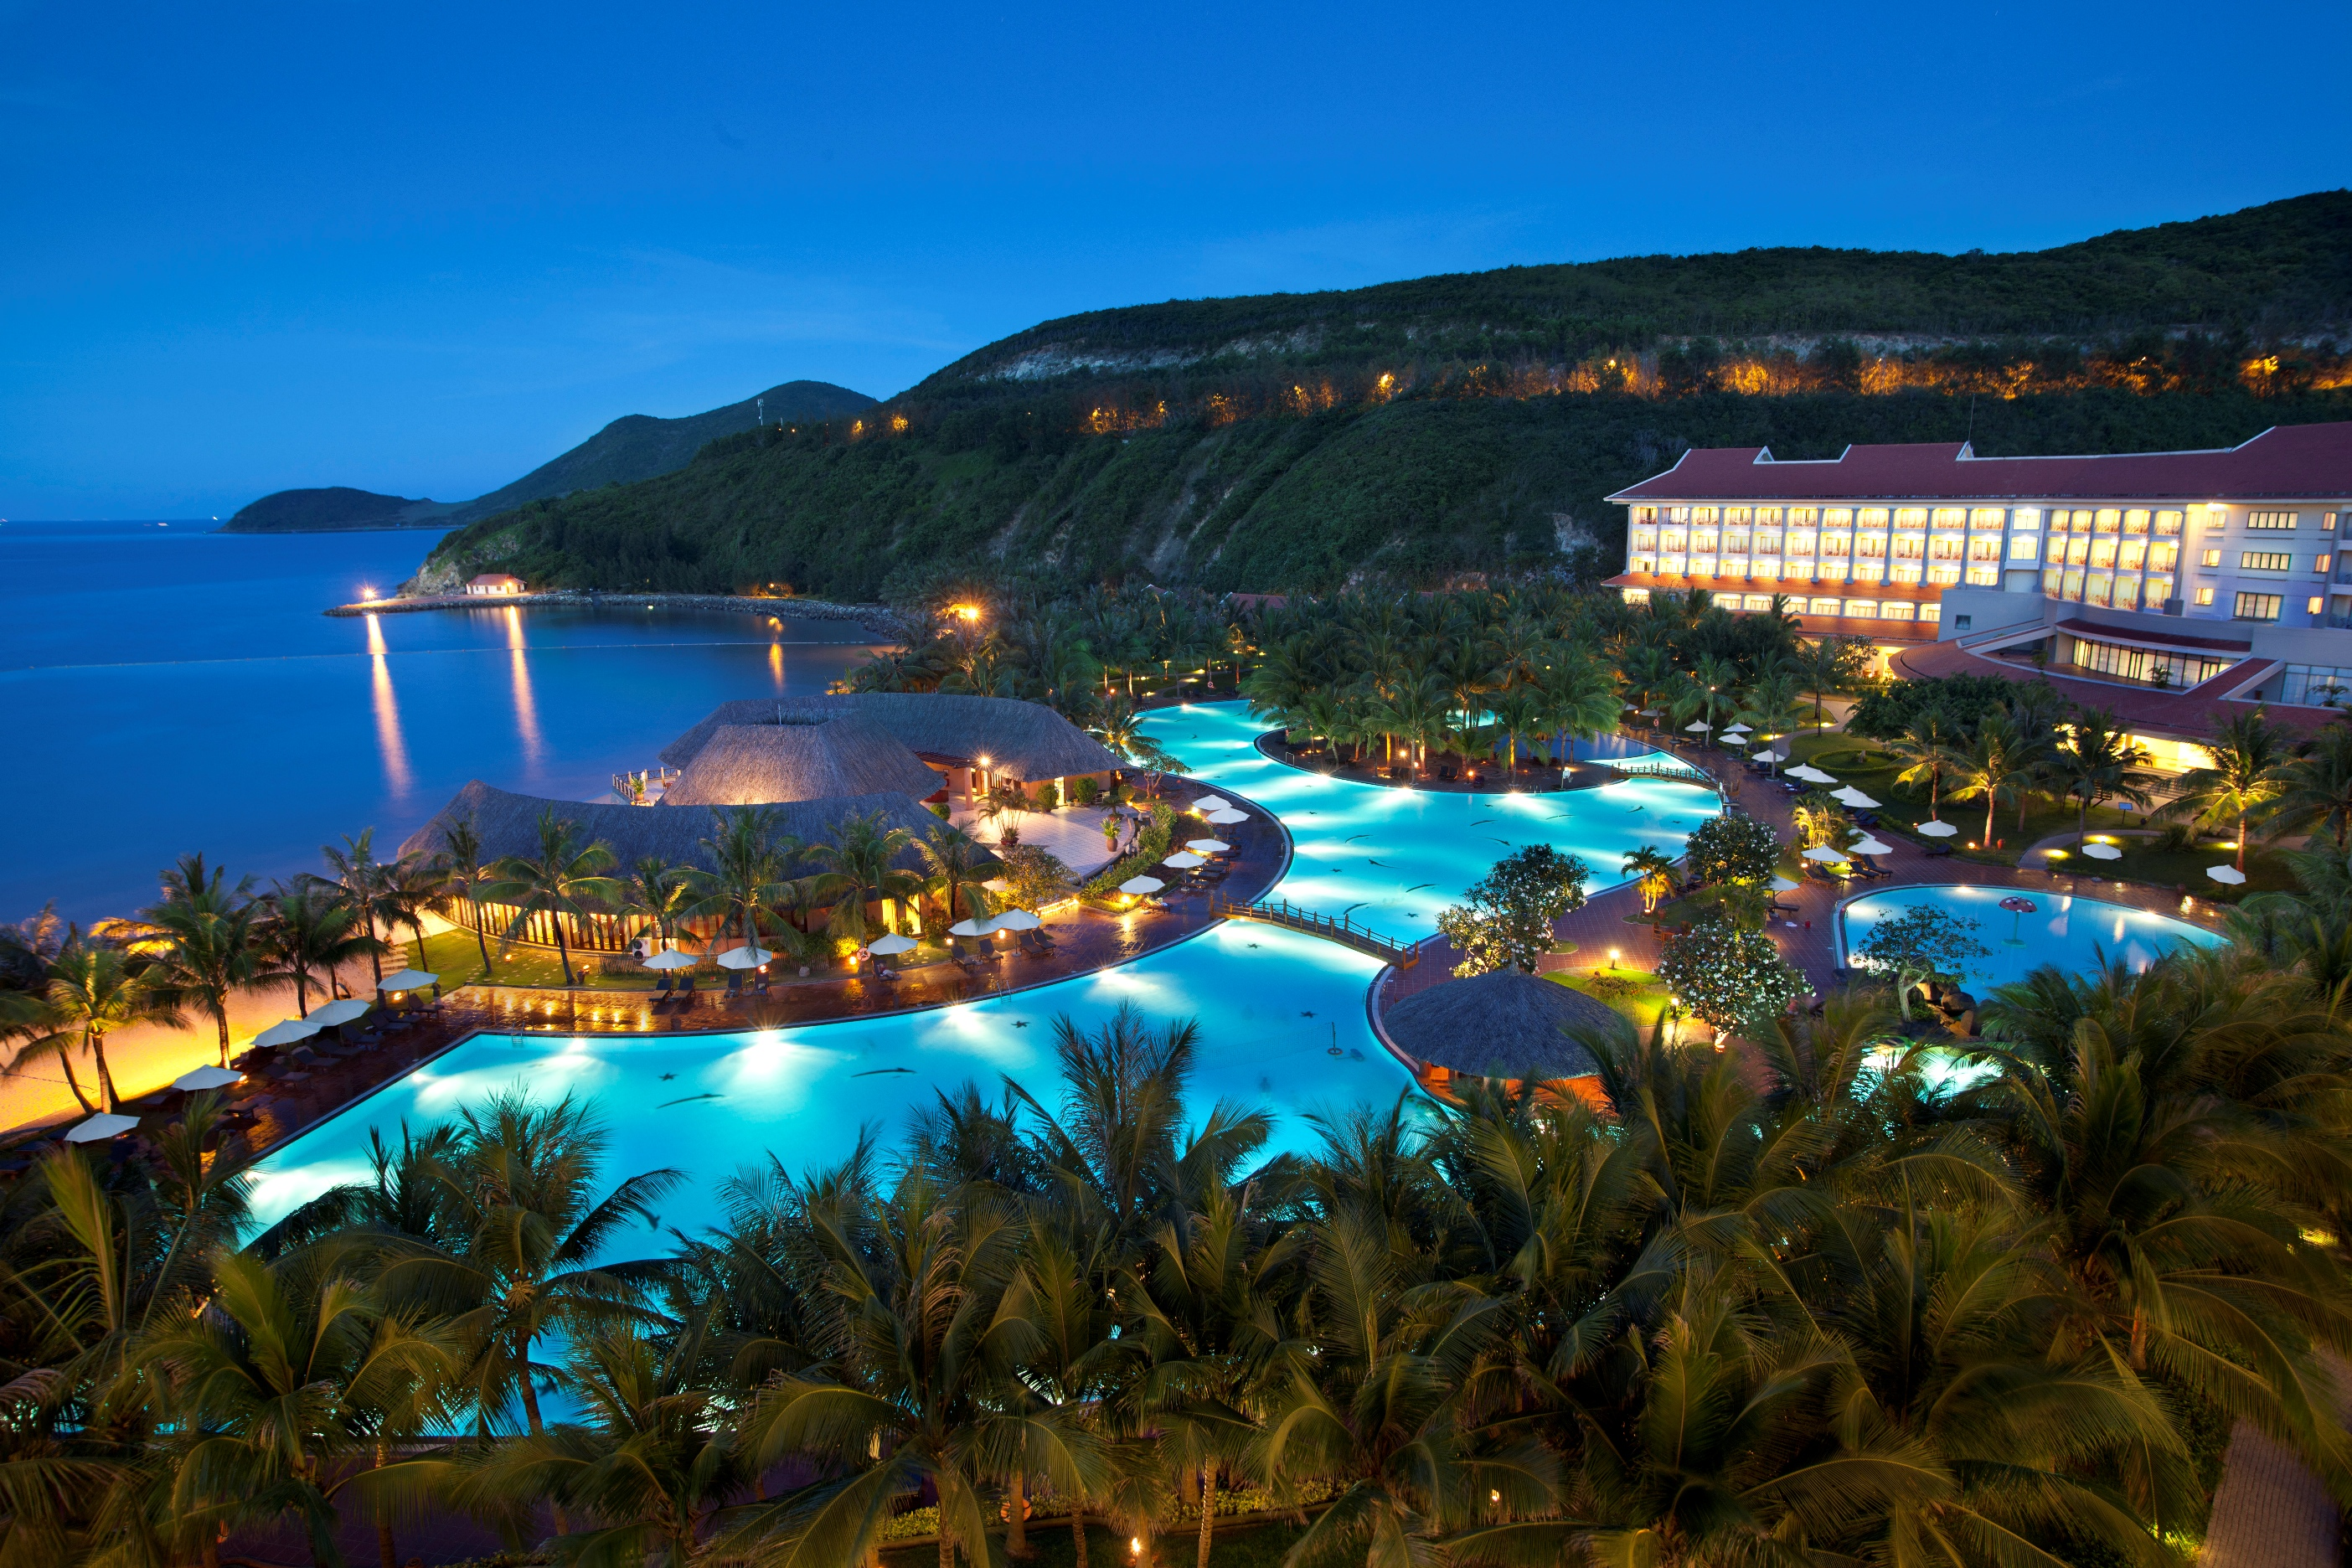 South China Sea S 9 Best Beach Resorts